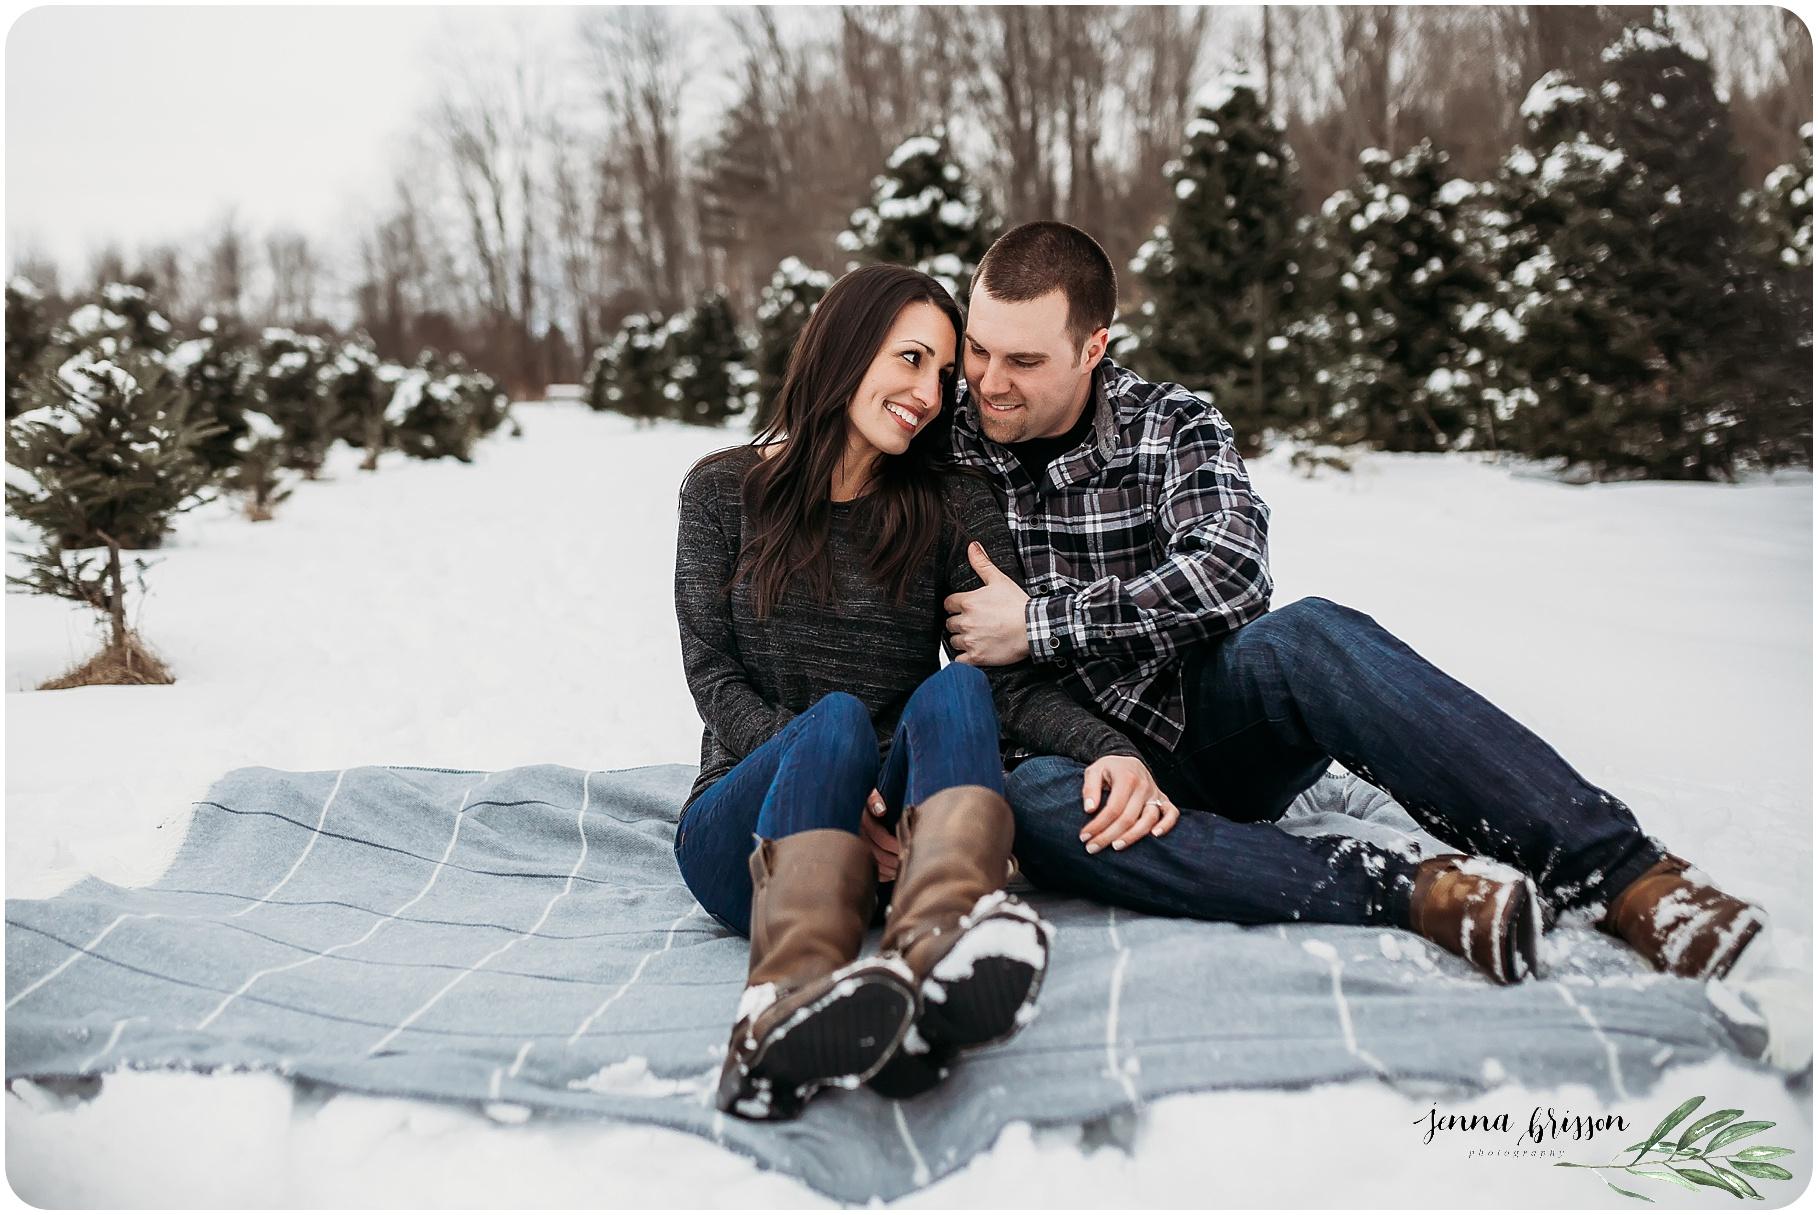 Vermont Wedding Photos Candid - Jenna Brisson Photography